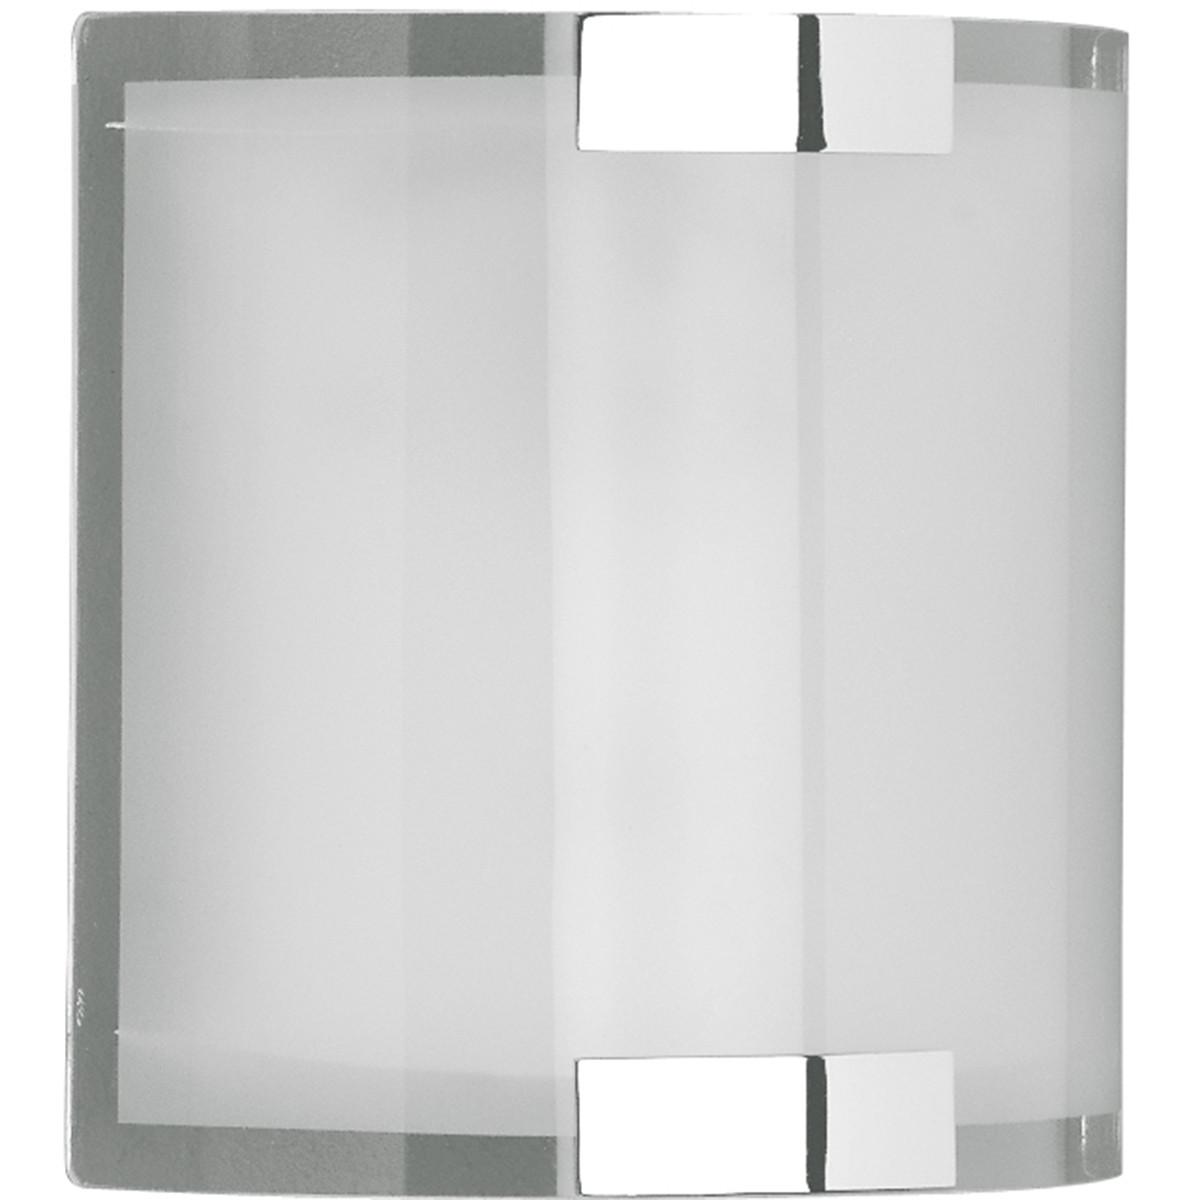 LED Wandlamp - Wandverlichting - Trion Derbio - E14 Fitting - Rechthoek - Mat Chroom - Aluminium